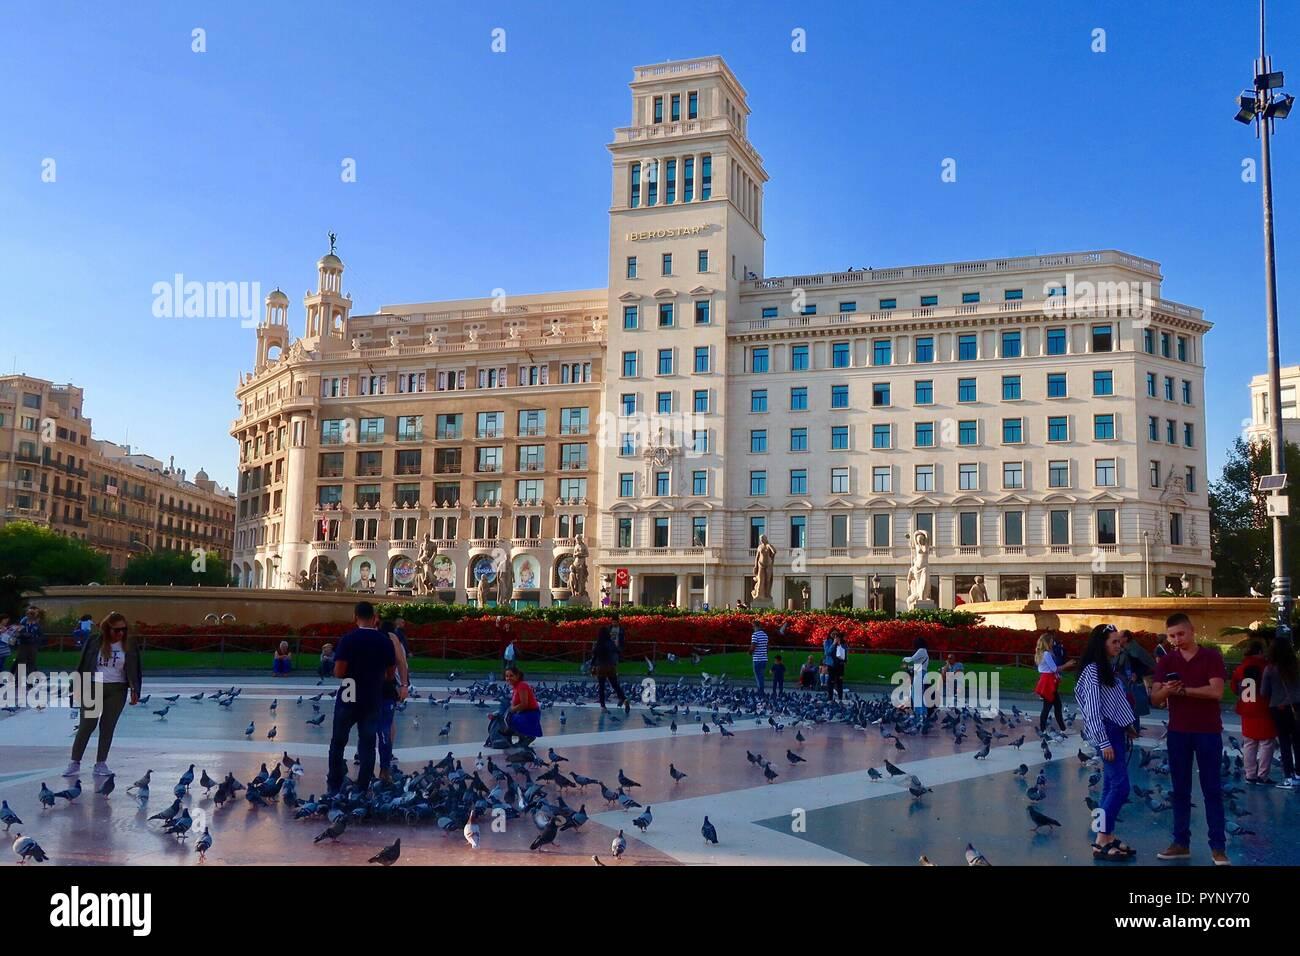 iberostar-hotel-place-de-catalunya-barce